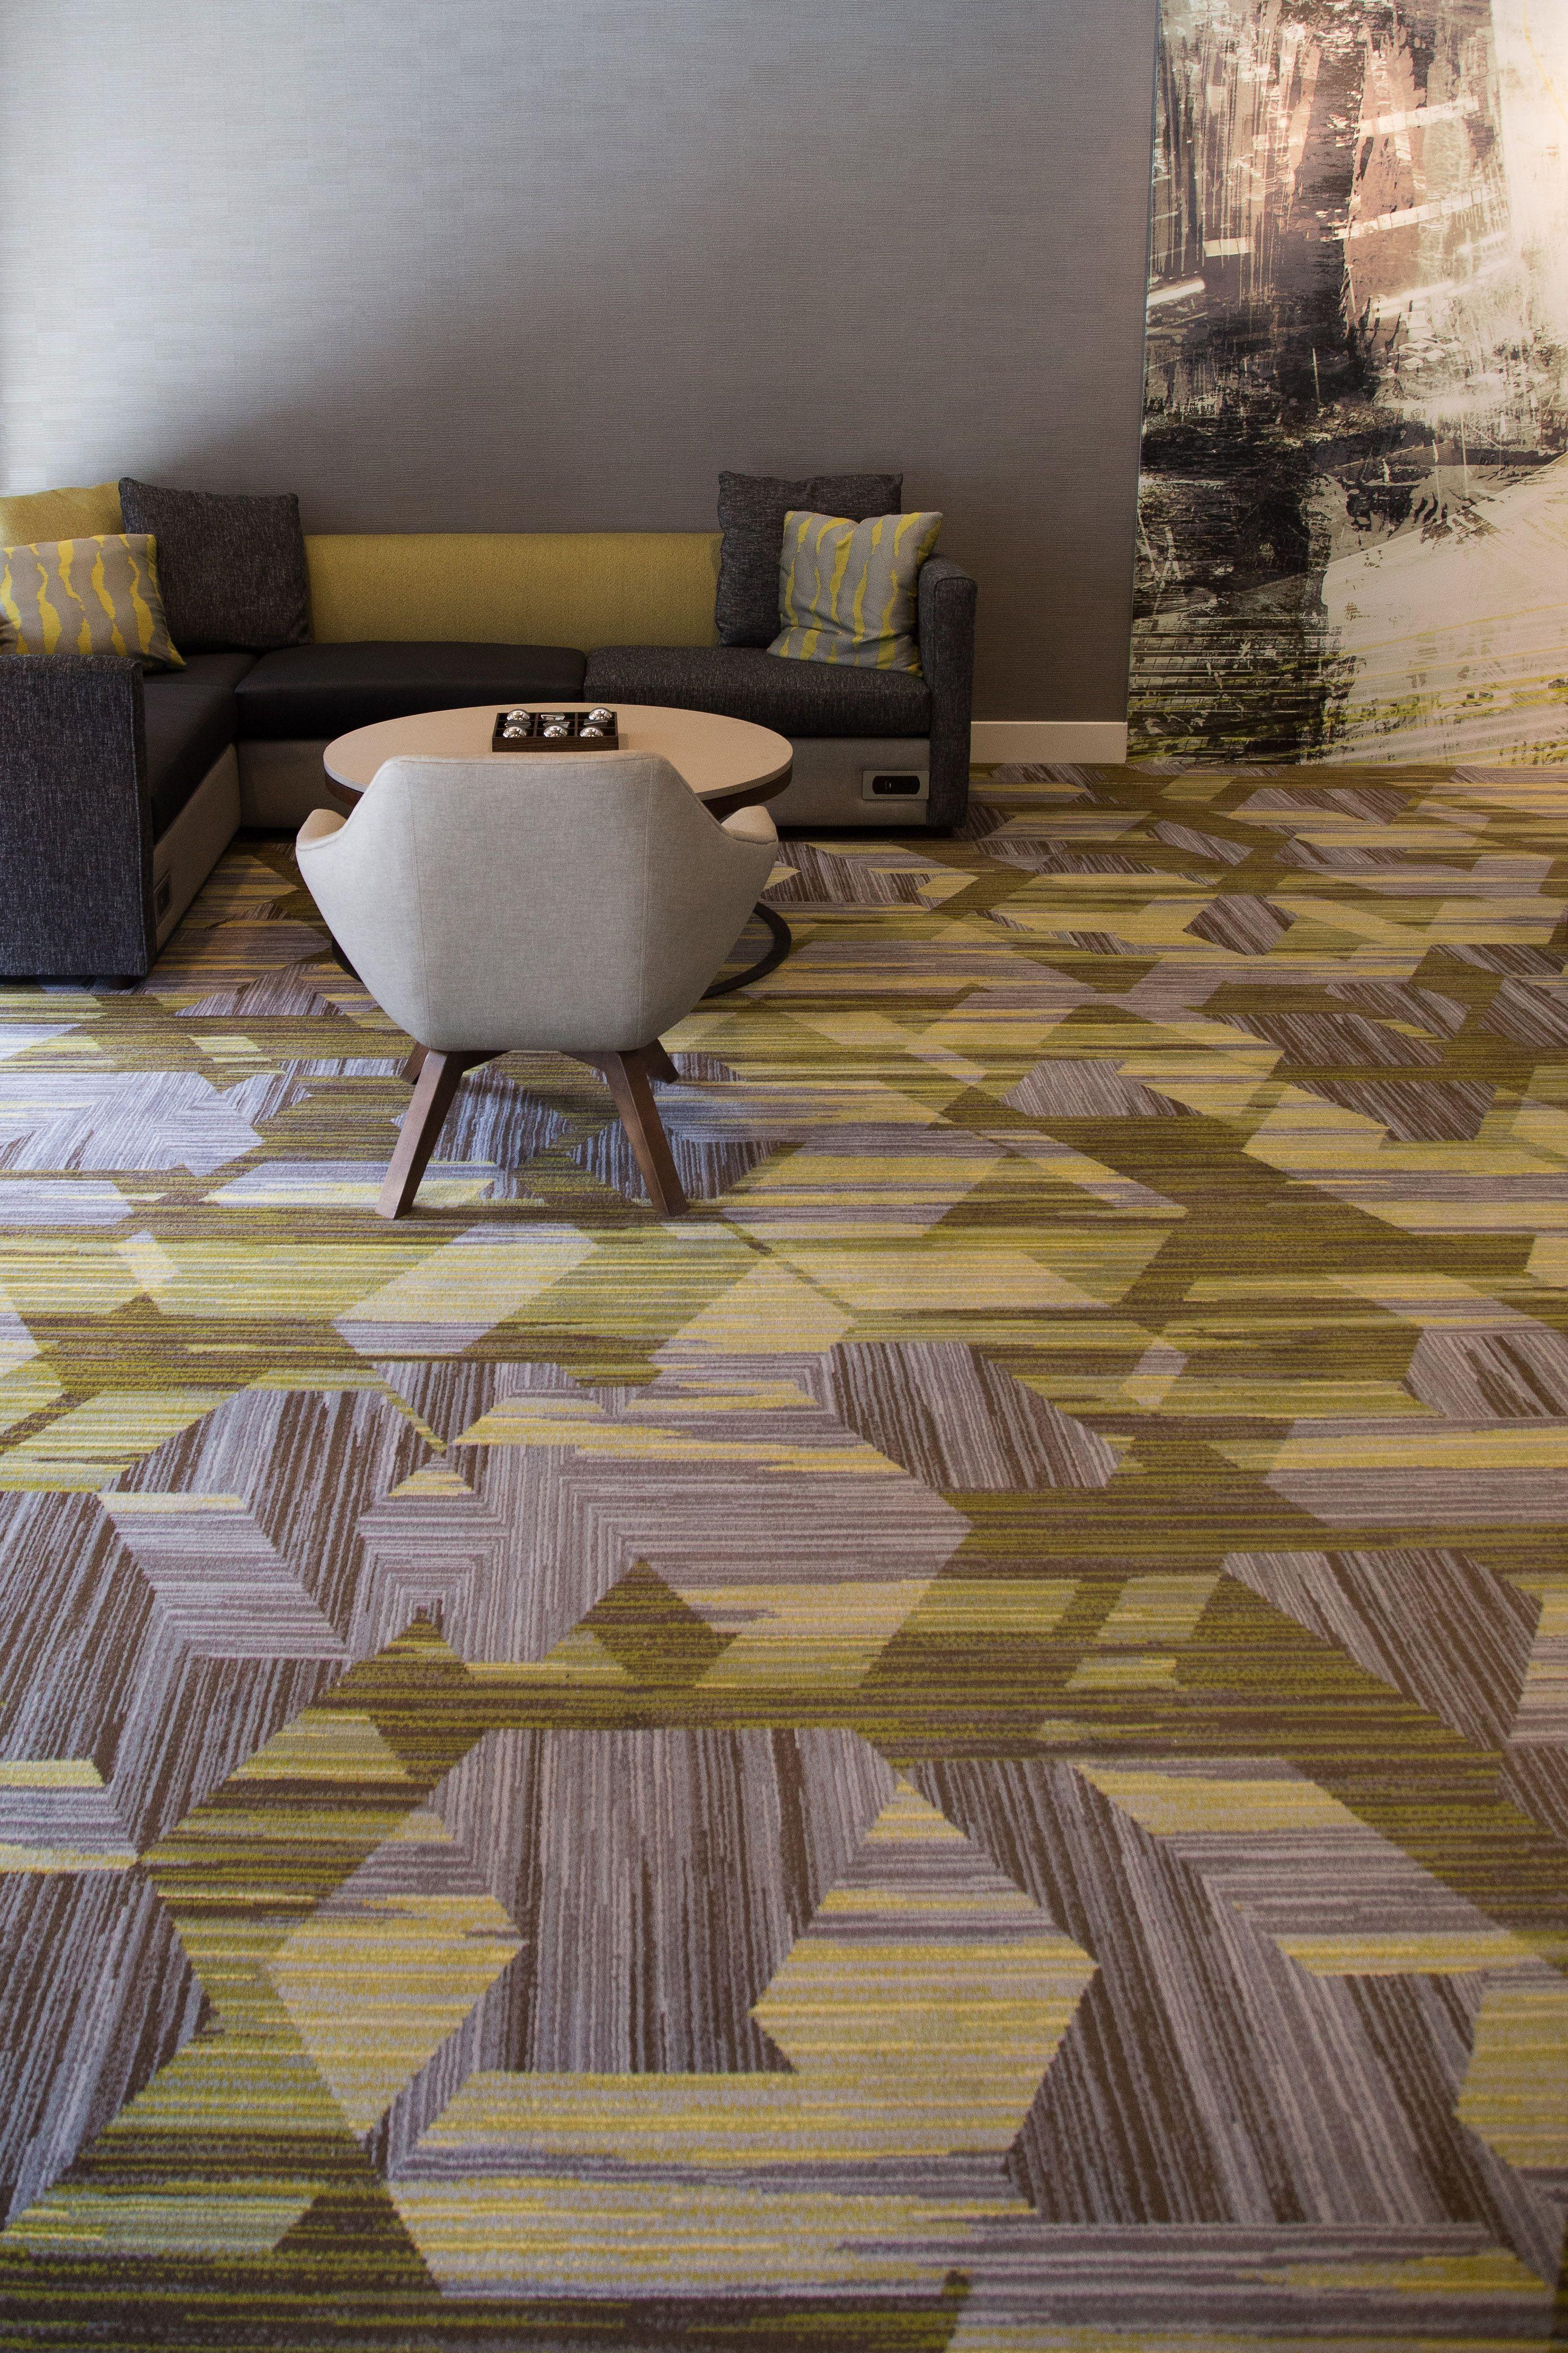 Courtyard Marriott Salt Lake City Downtown Custom Carpet By Crossley Axminster Www Crossleyax Com